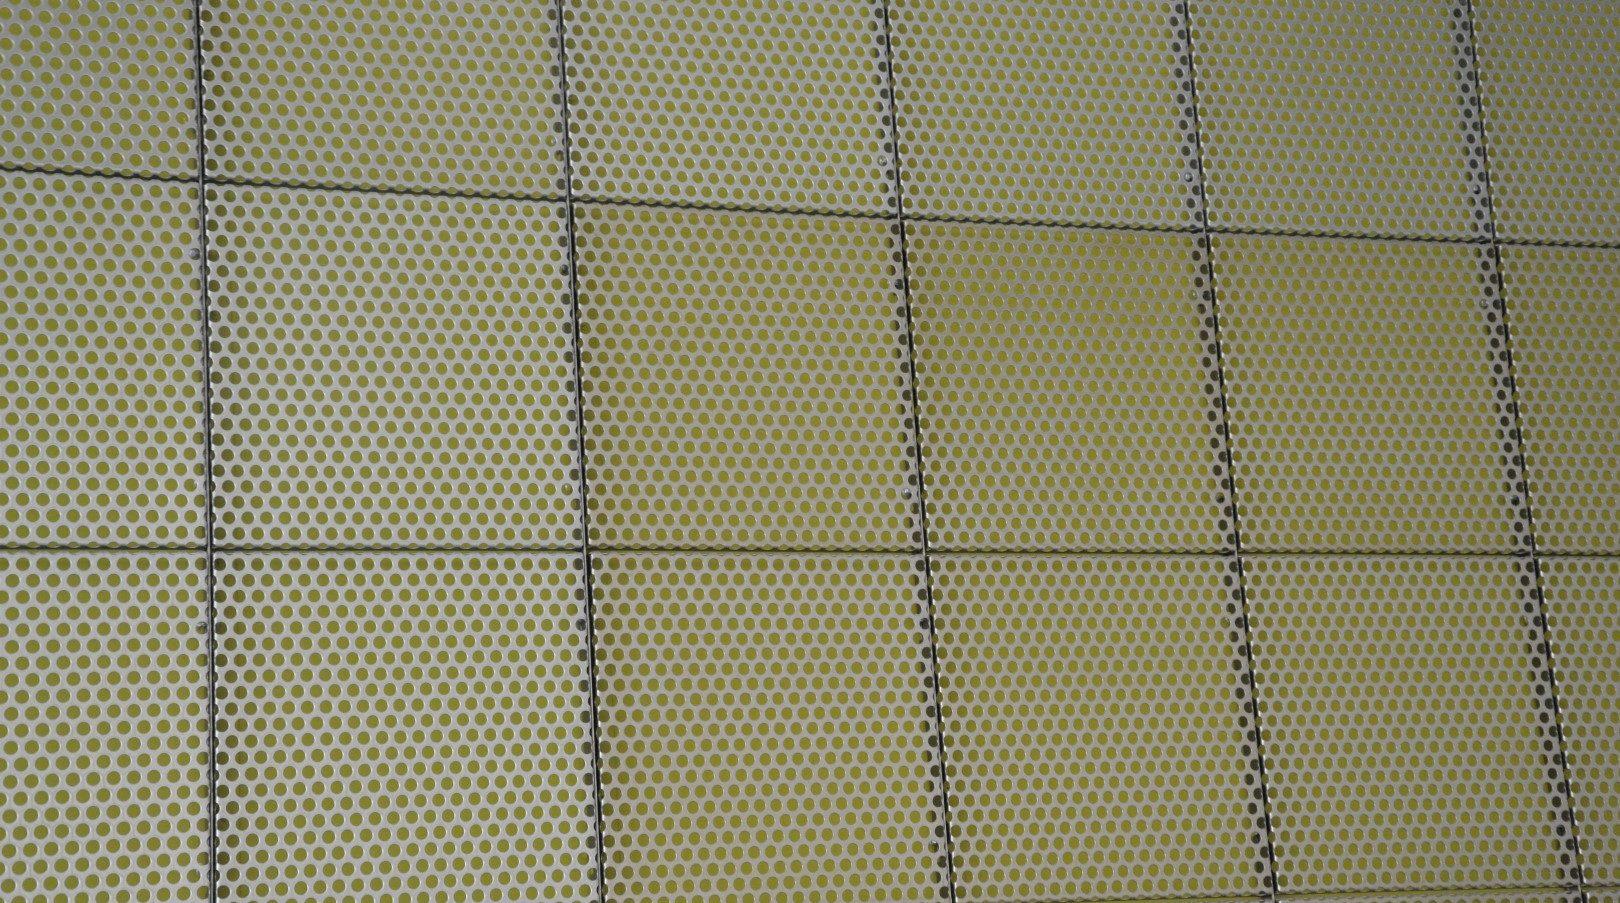 MD Designperforatie panelen Amstelcampus Interieurbekleding